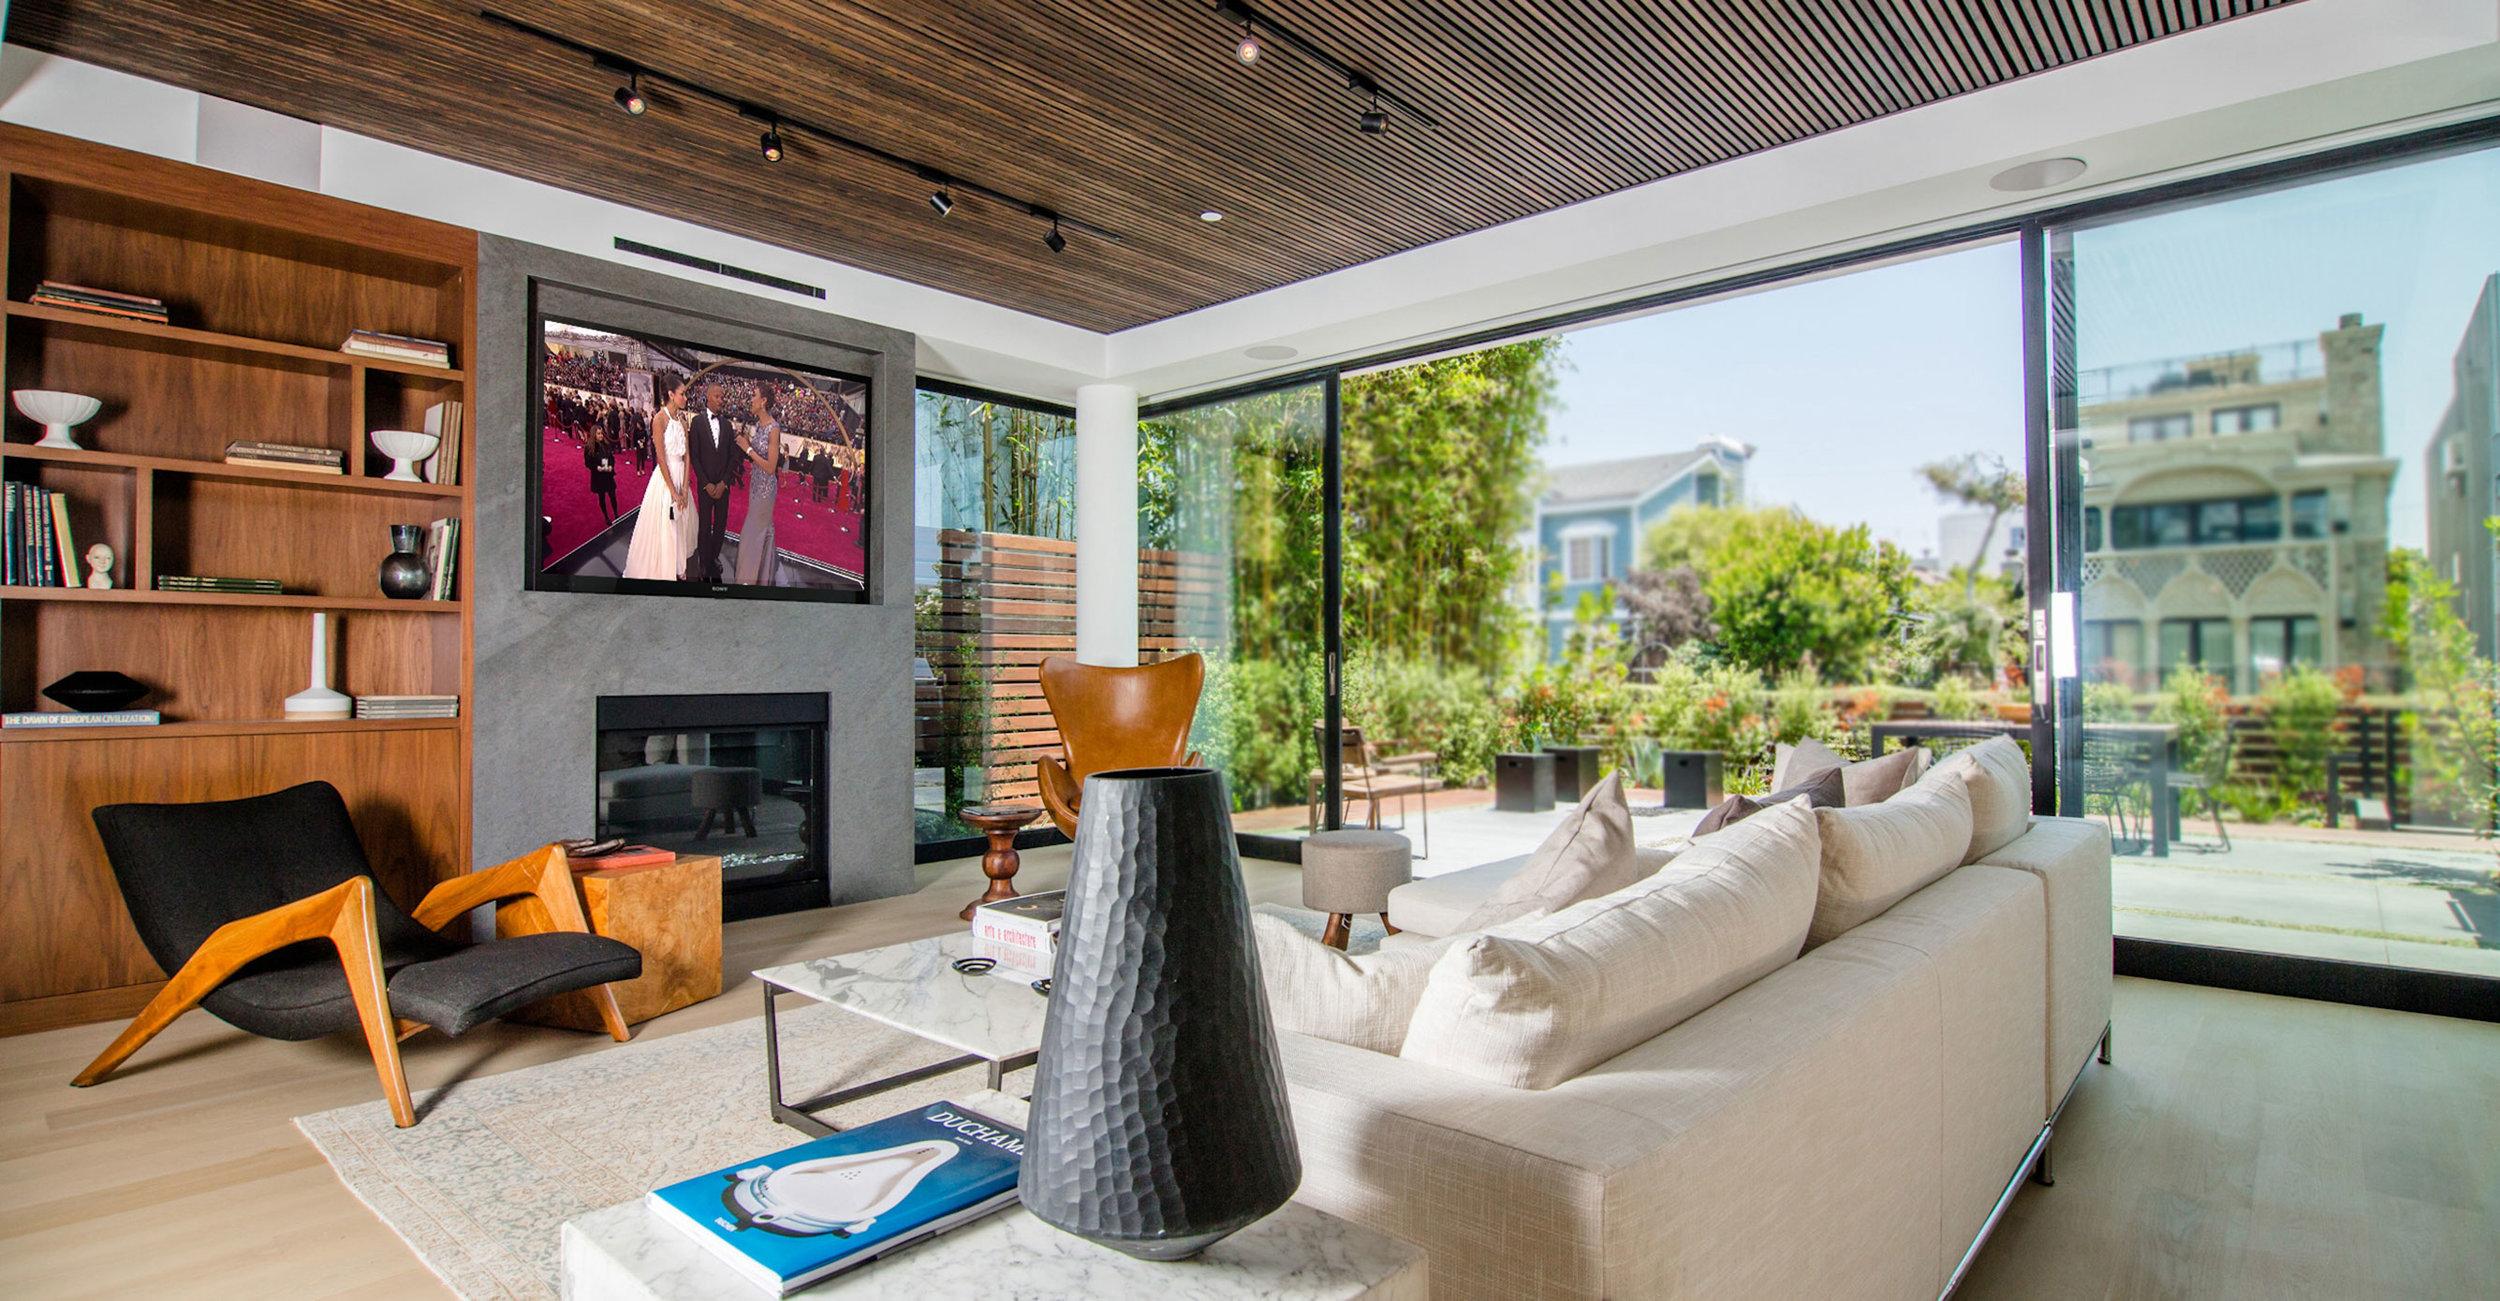 7-Living-room-open-concept-modern-outdoorliving-Silicon-Bay.jpg